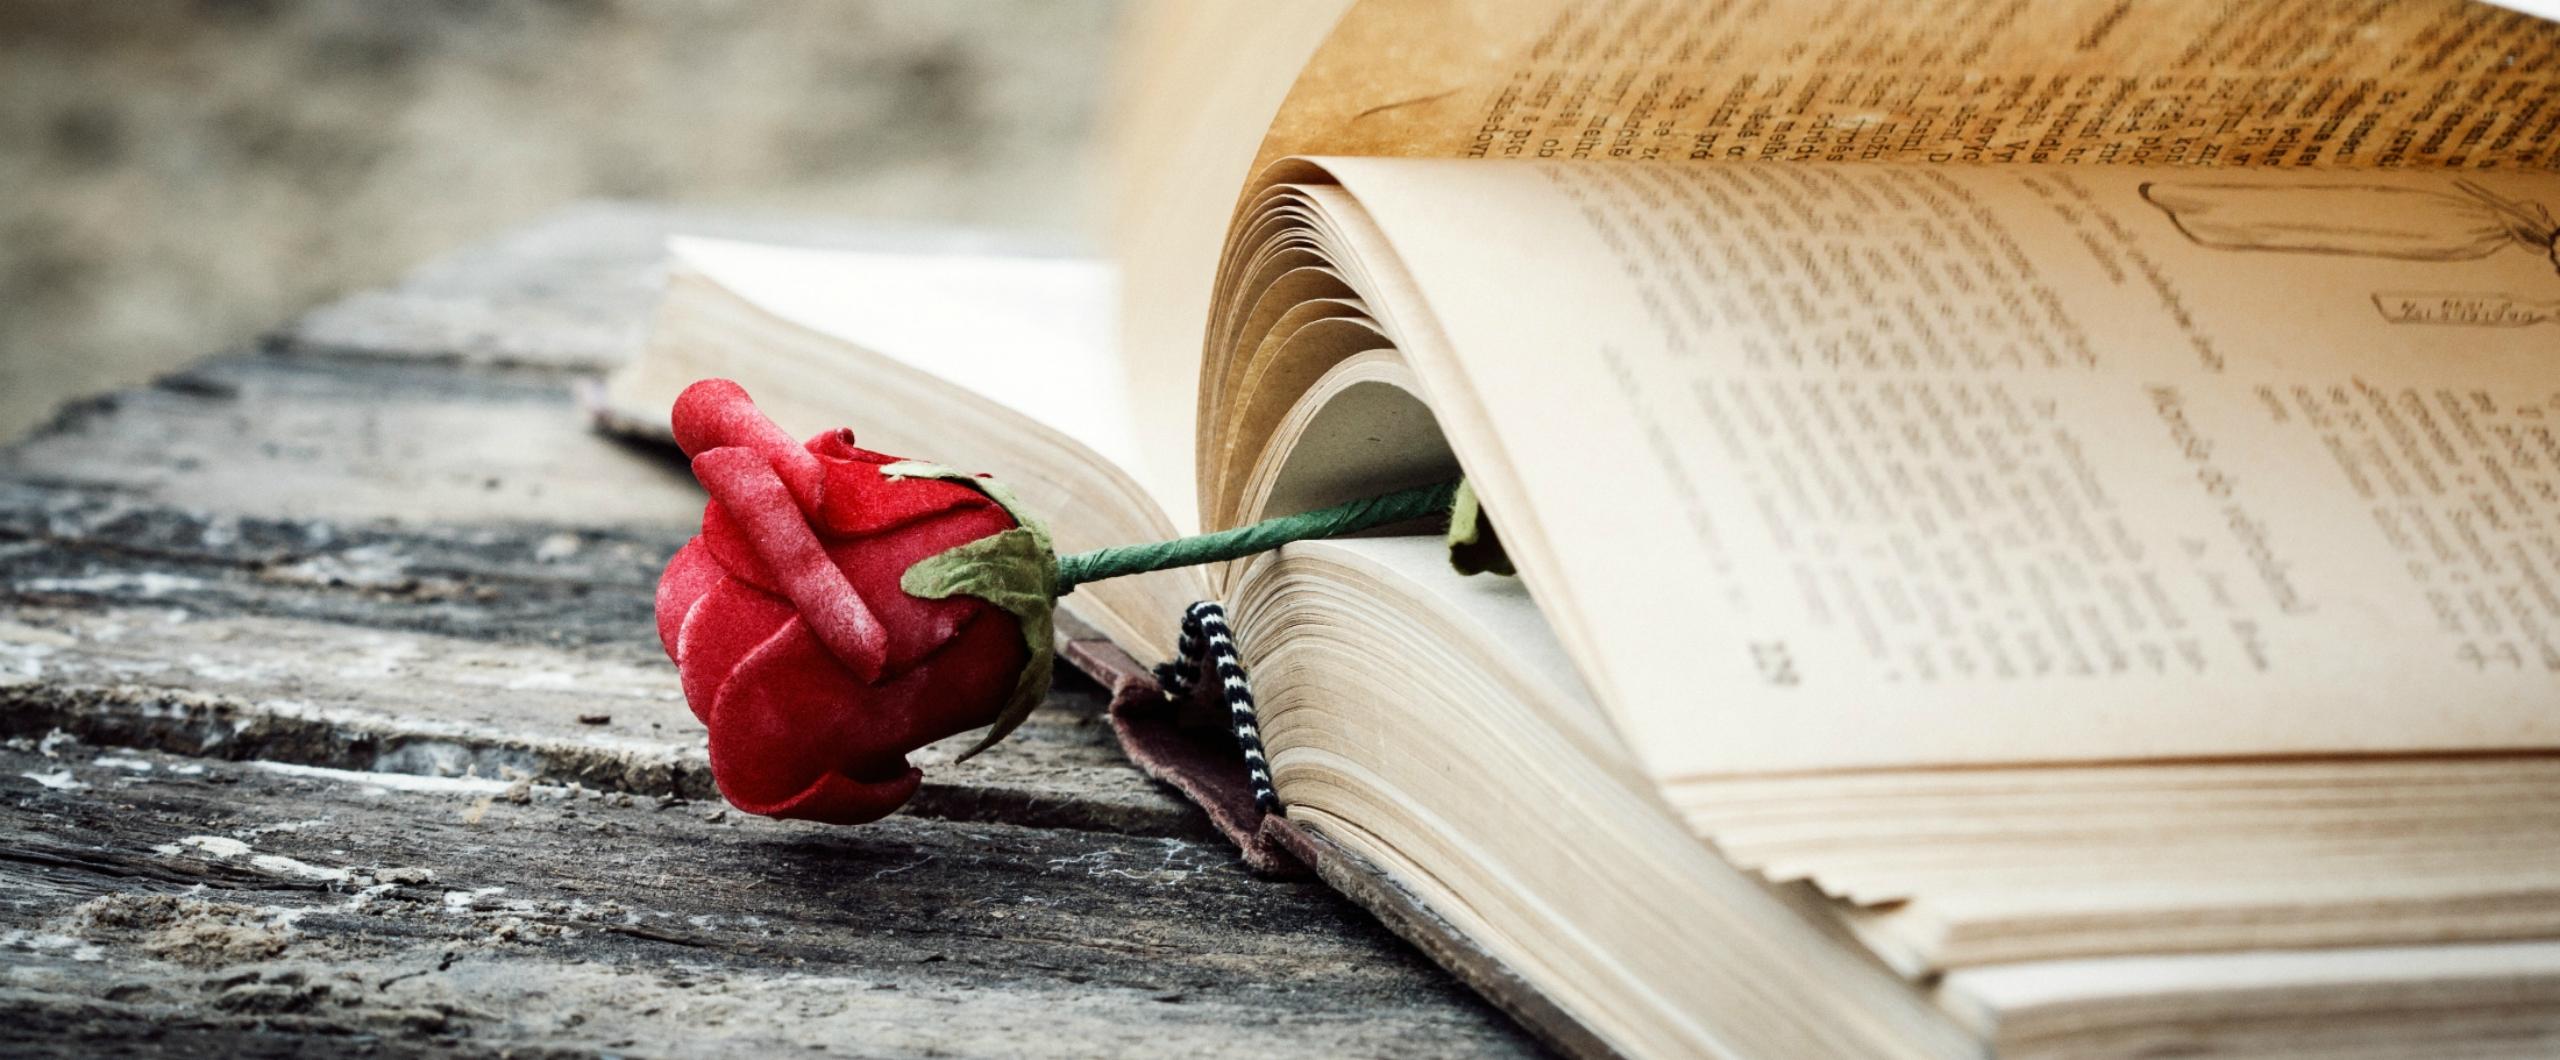 Romance Pics, Artistic Collection